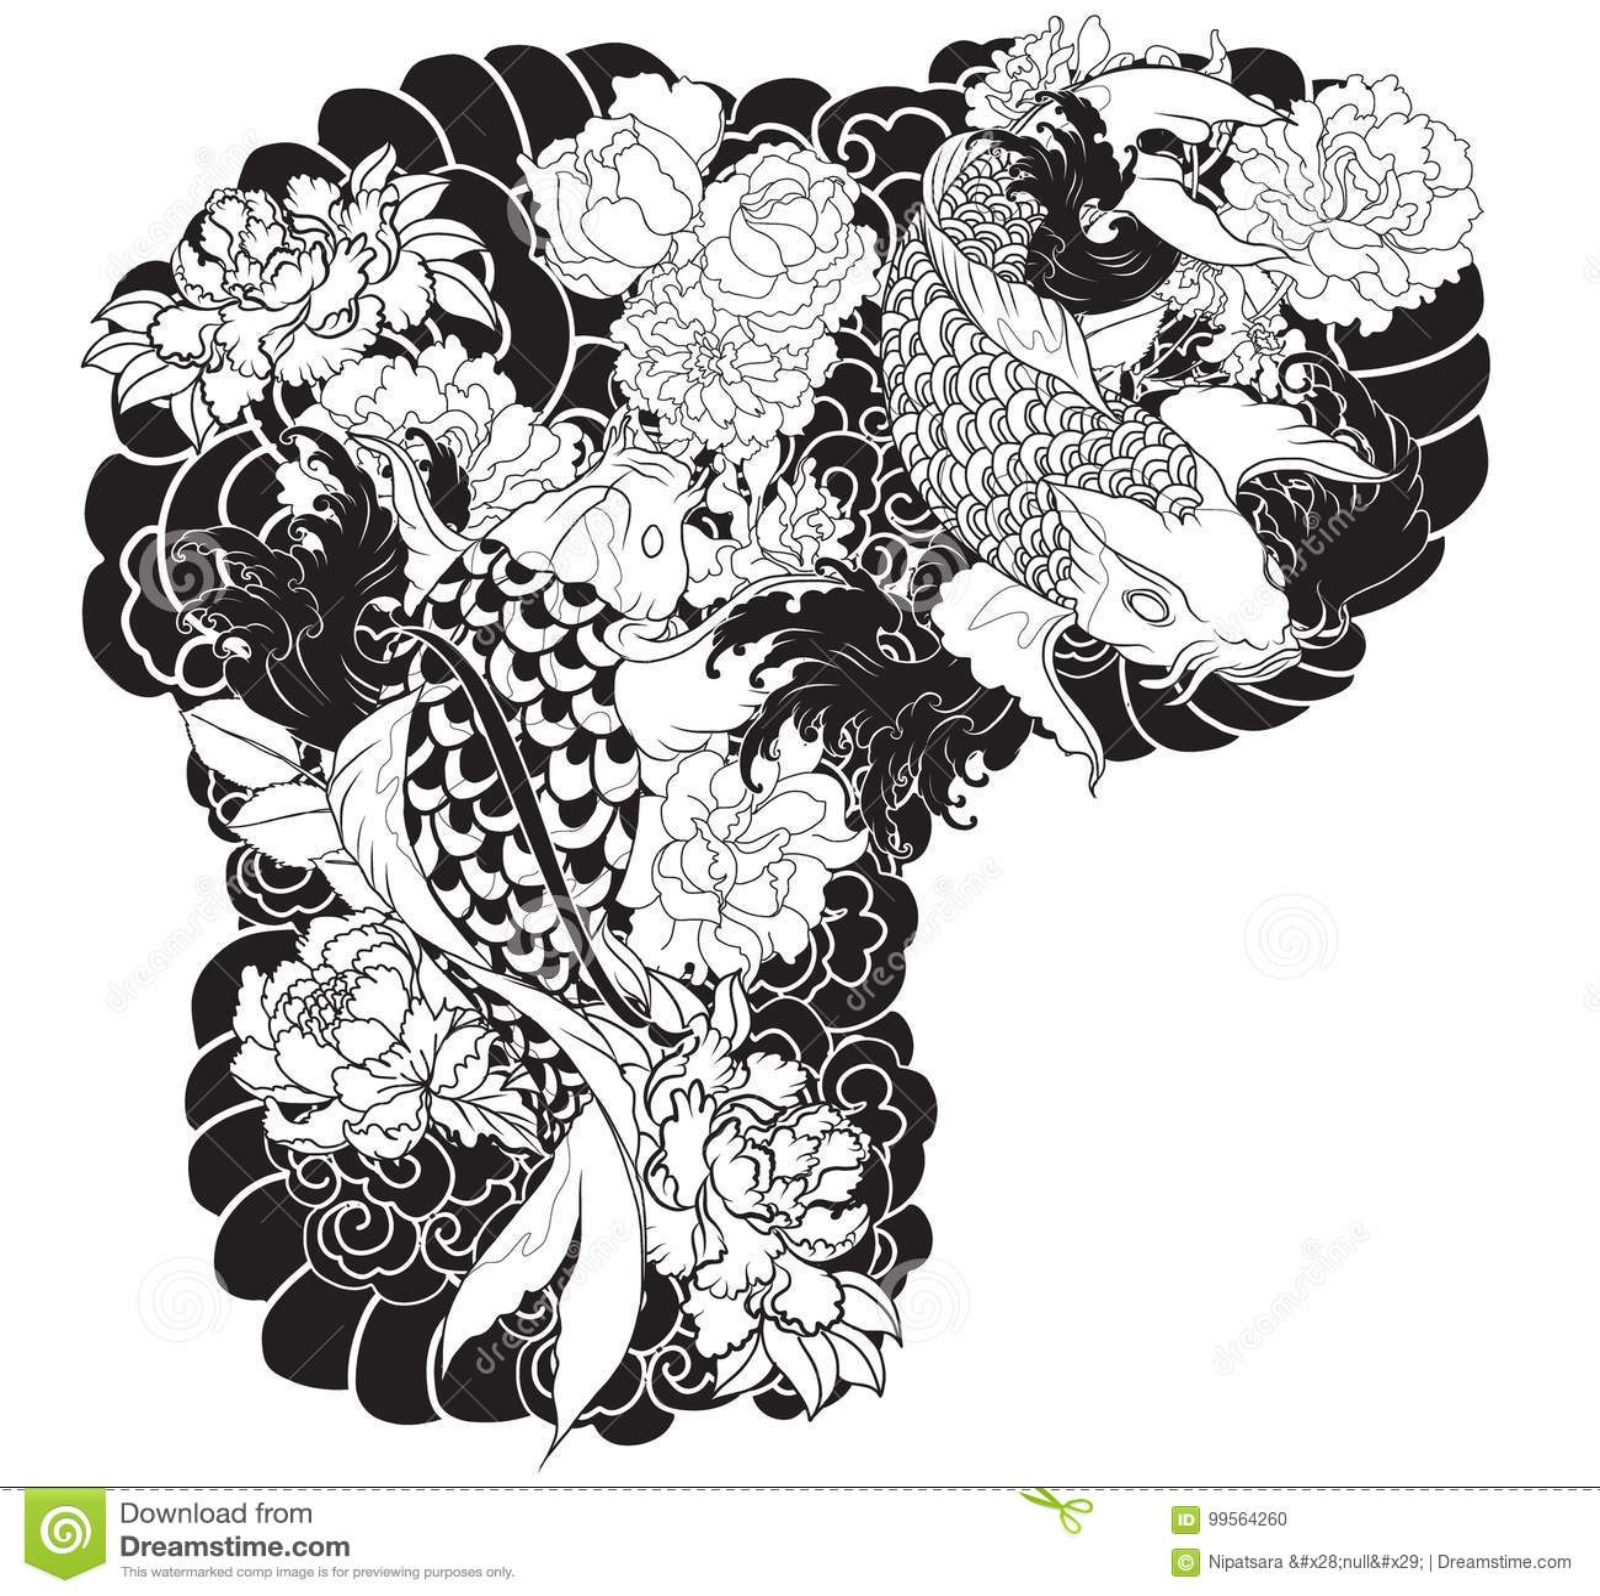 Beautiful colorful koi carp with water splash lotus and peony beautiful colorful koi carp water splash lotus peony flower traditional japanese tattoo design hand drawn fish arm 99564260g izmirmasajfo